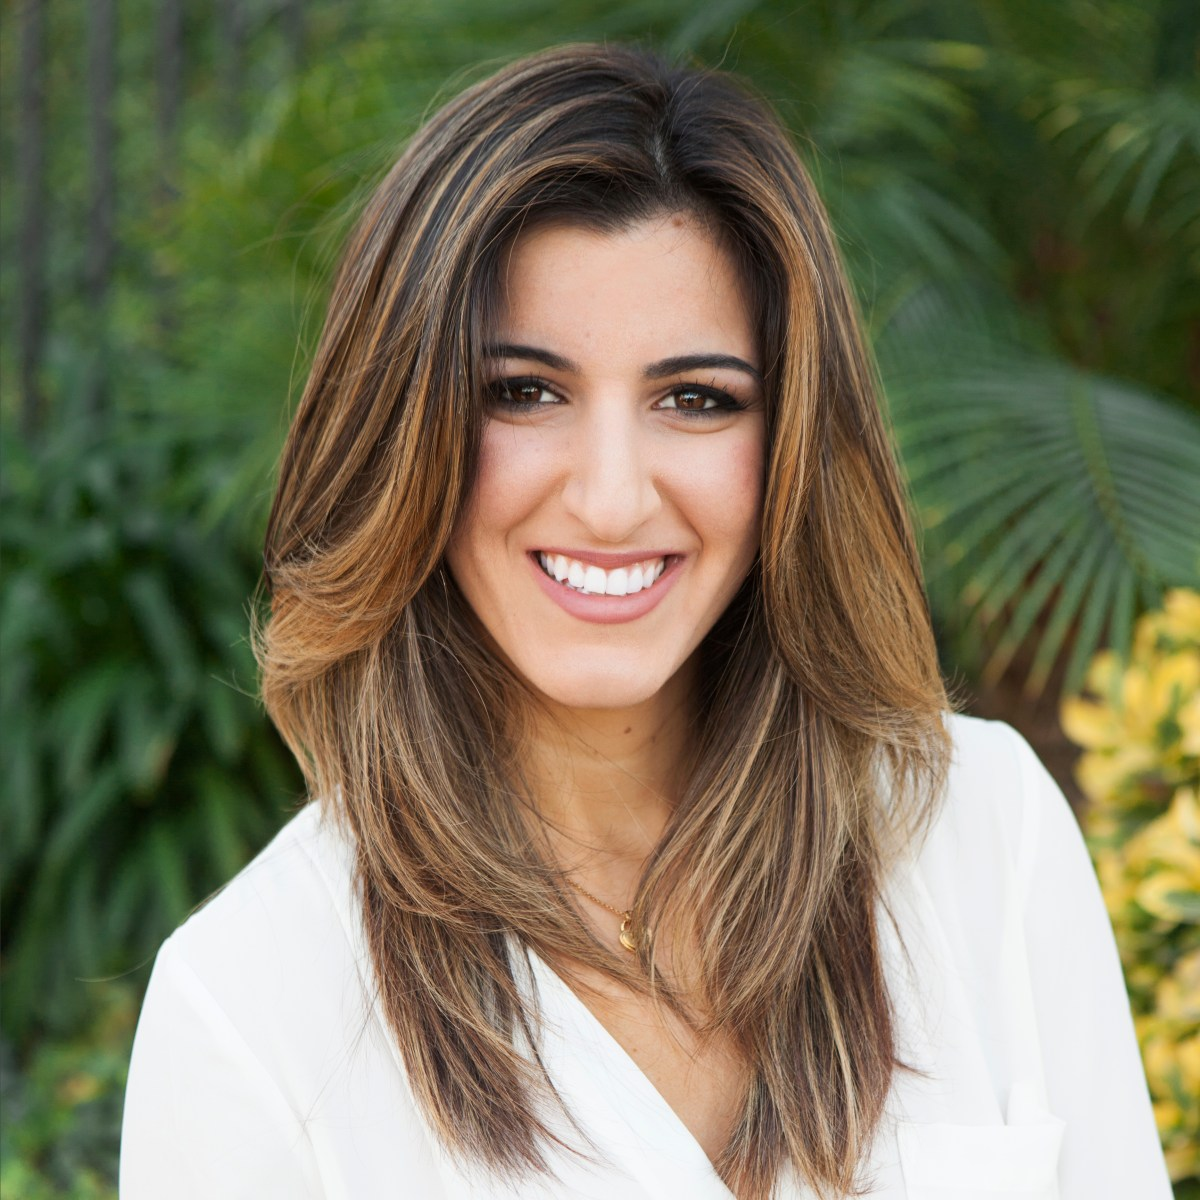 Michelle Tahan